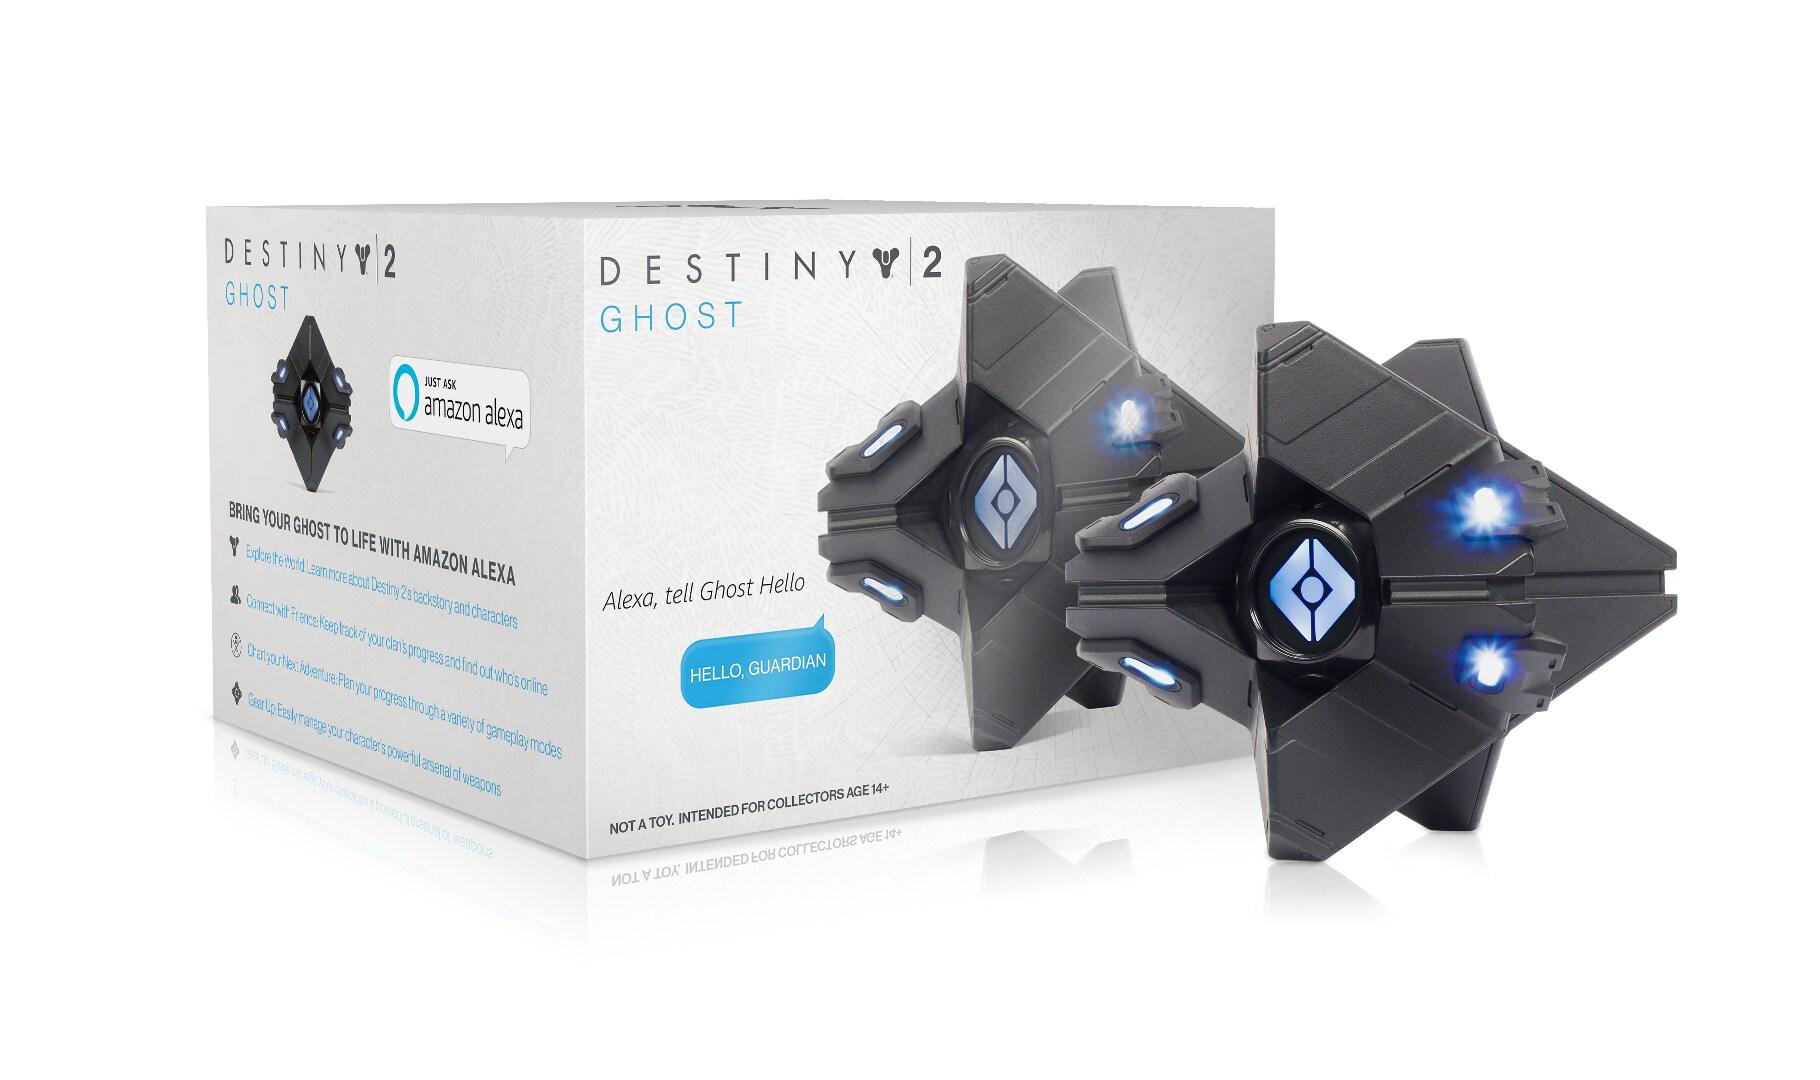 ghost-destiny-2-alexa